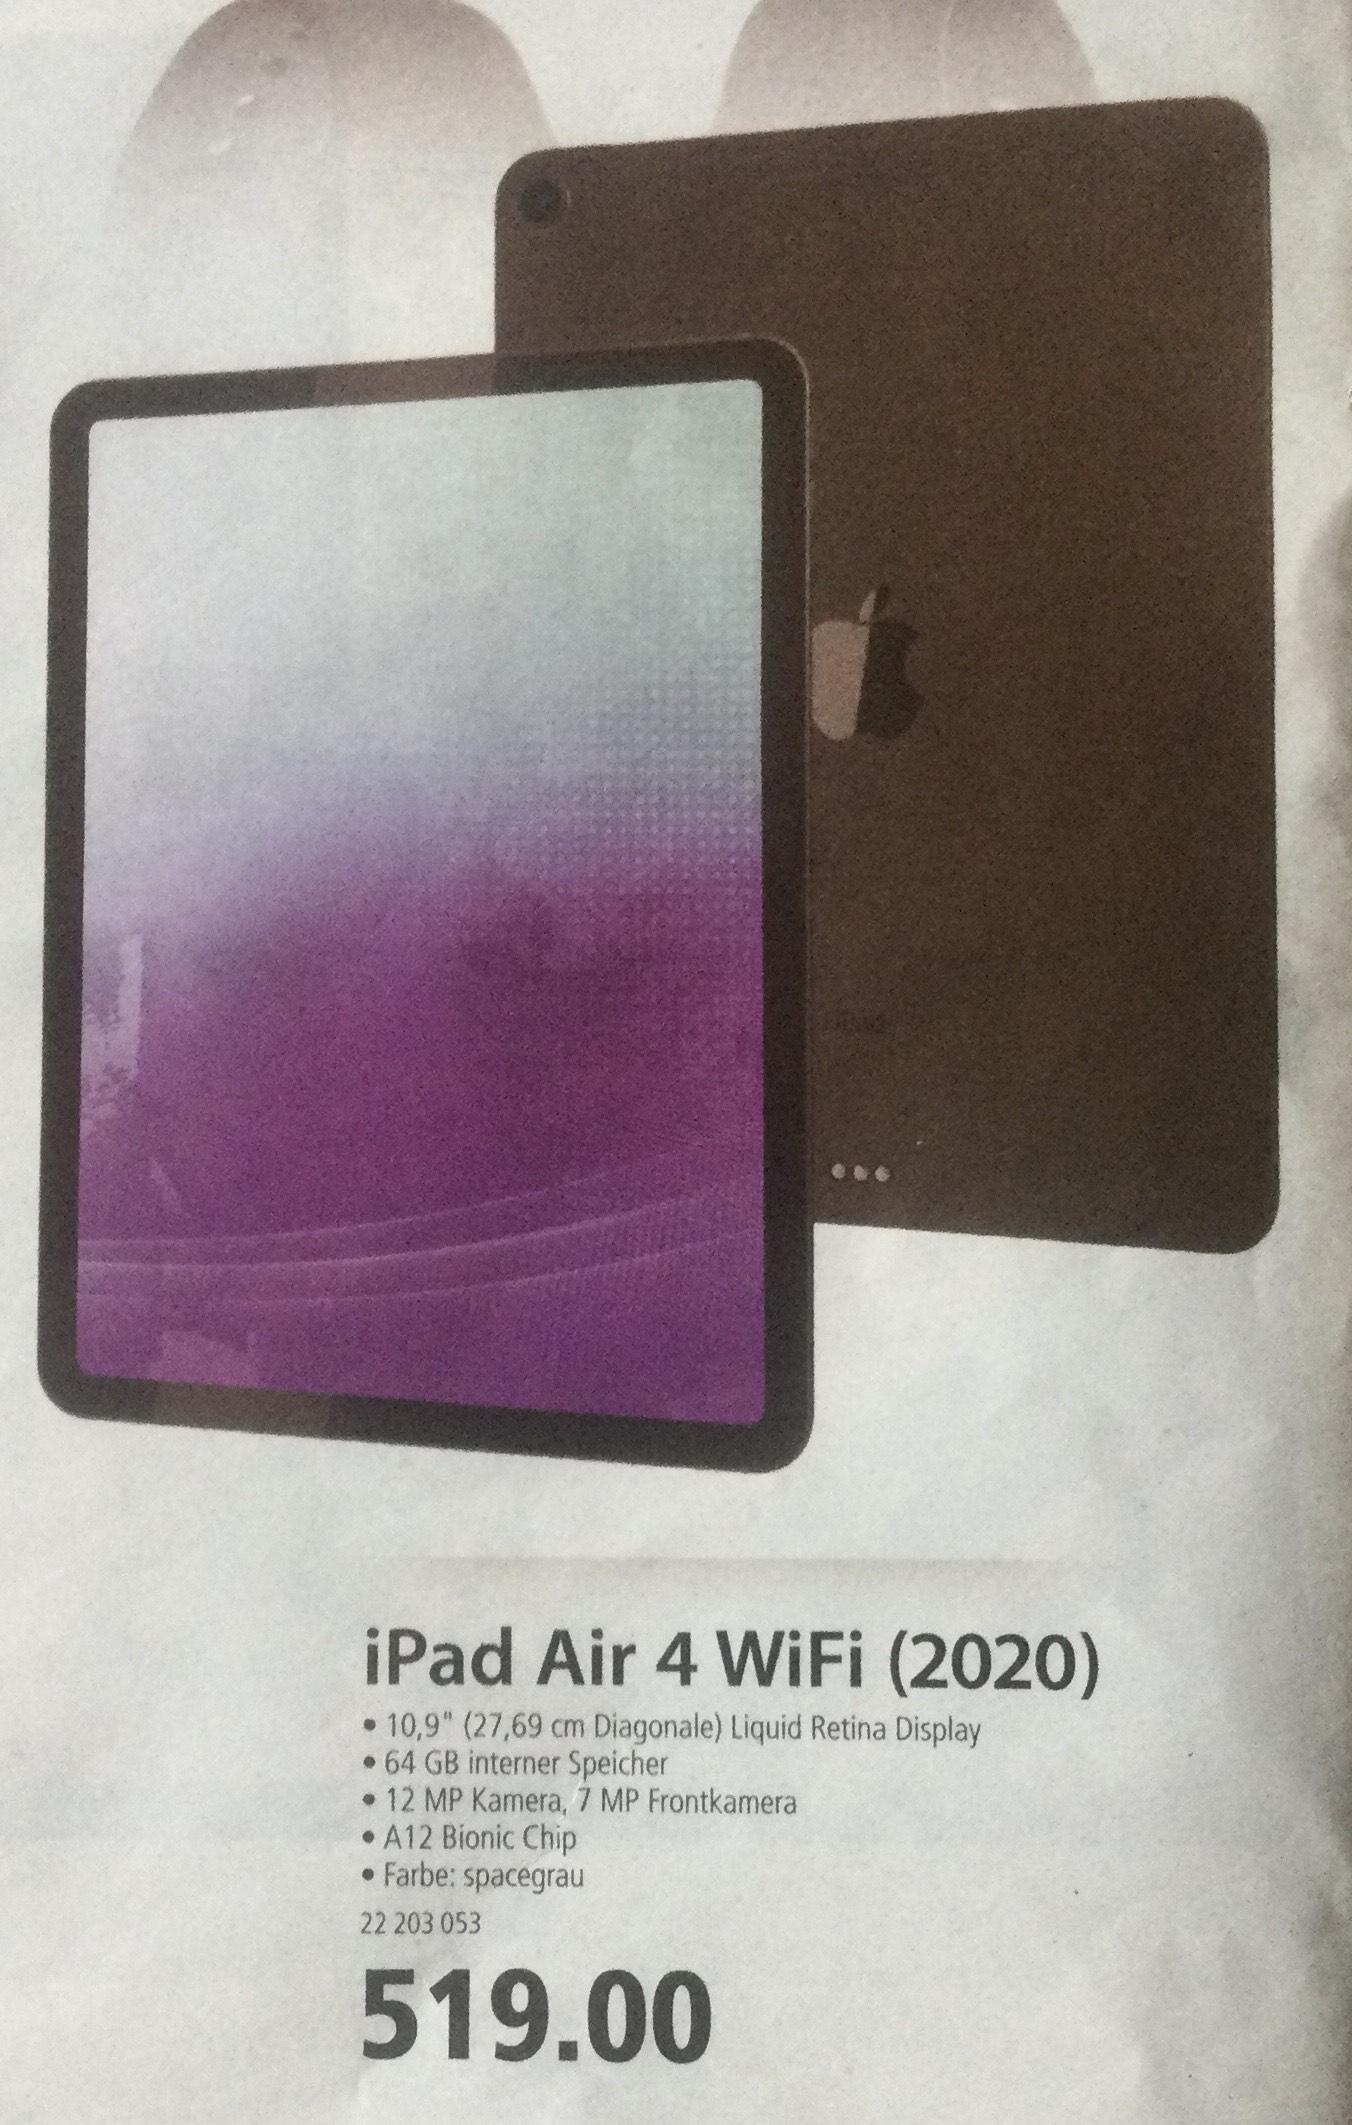 [Corporate Benefits Lokal] iPad Air 4 (2020) Selgros Cash & Carry